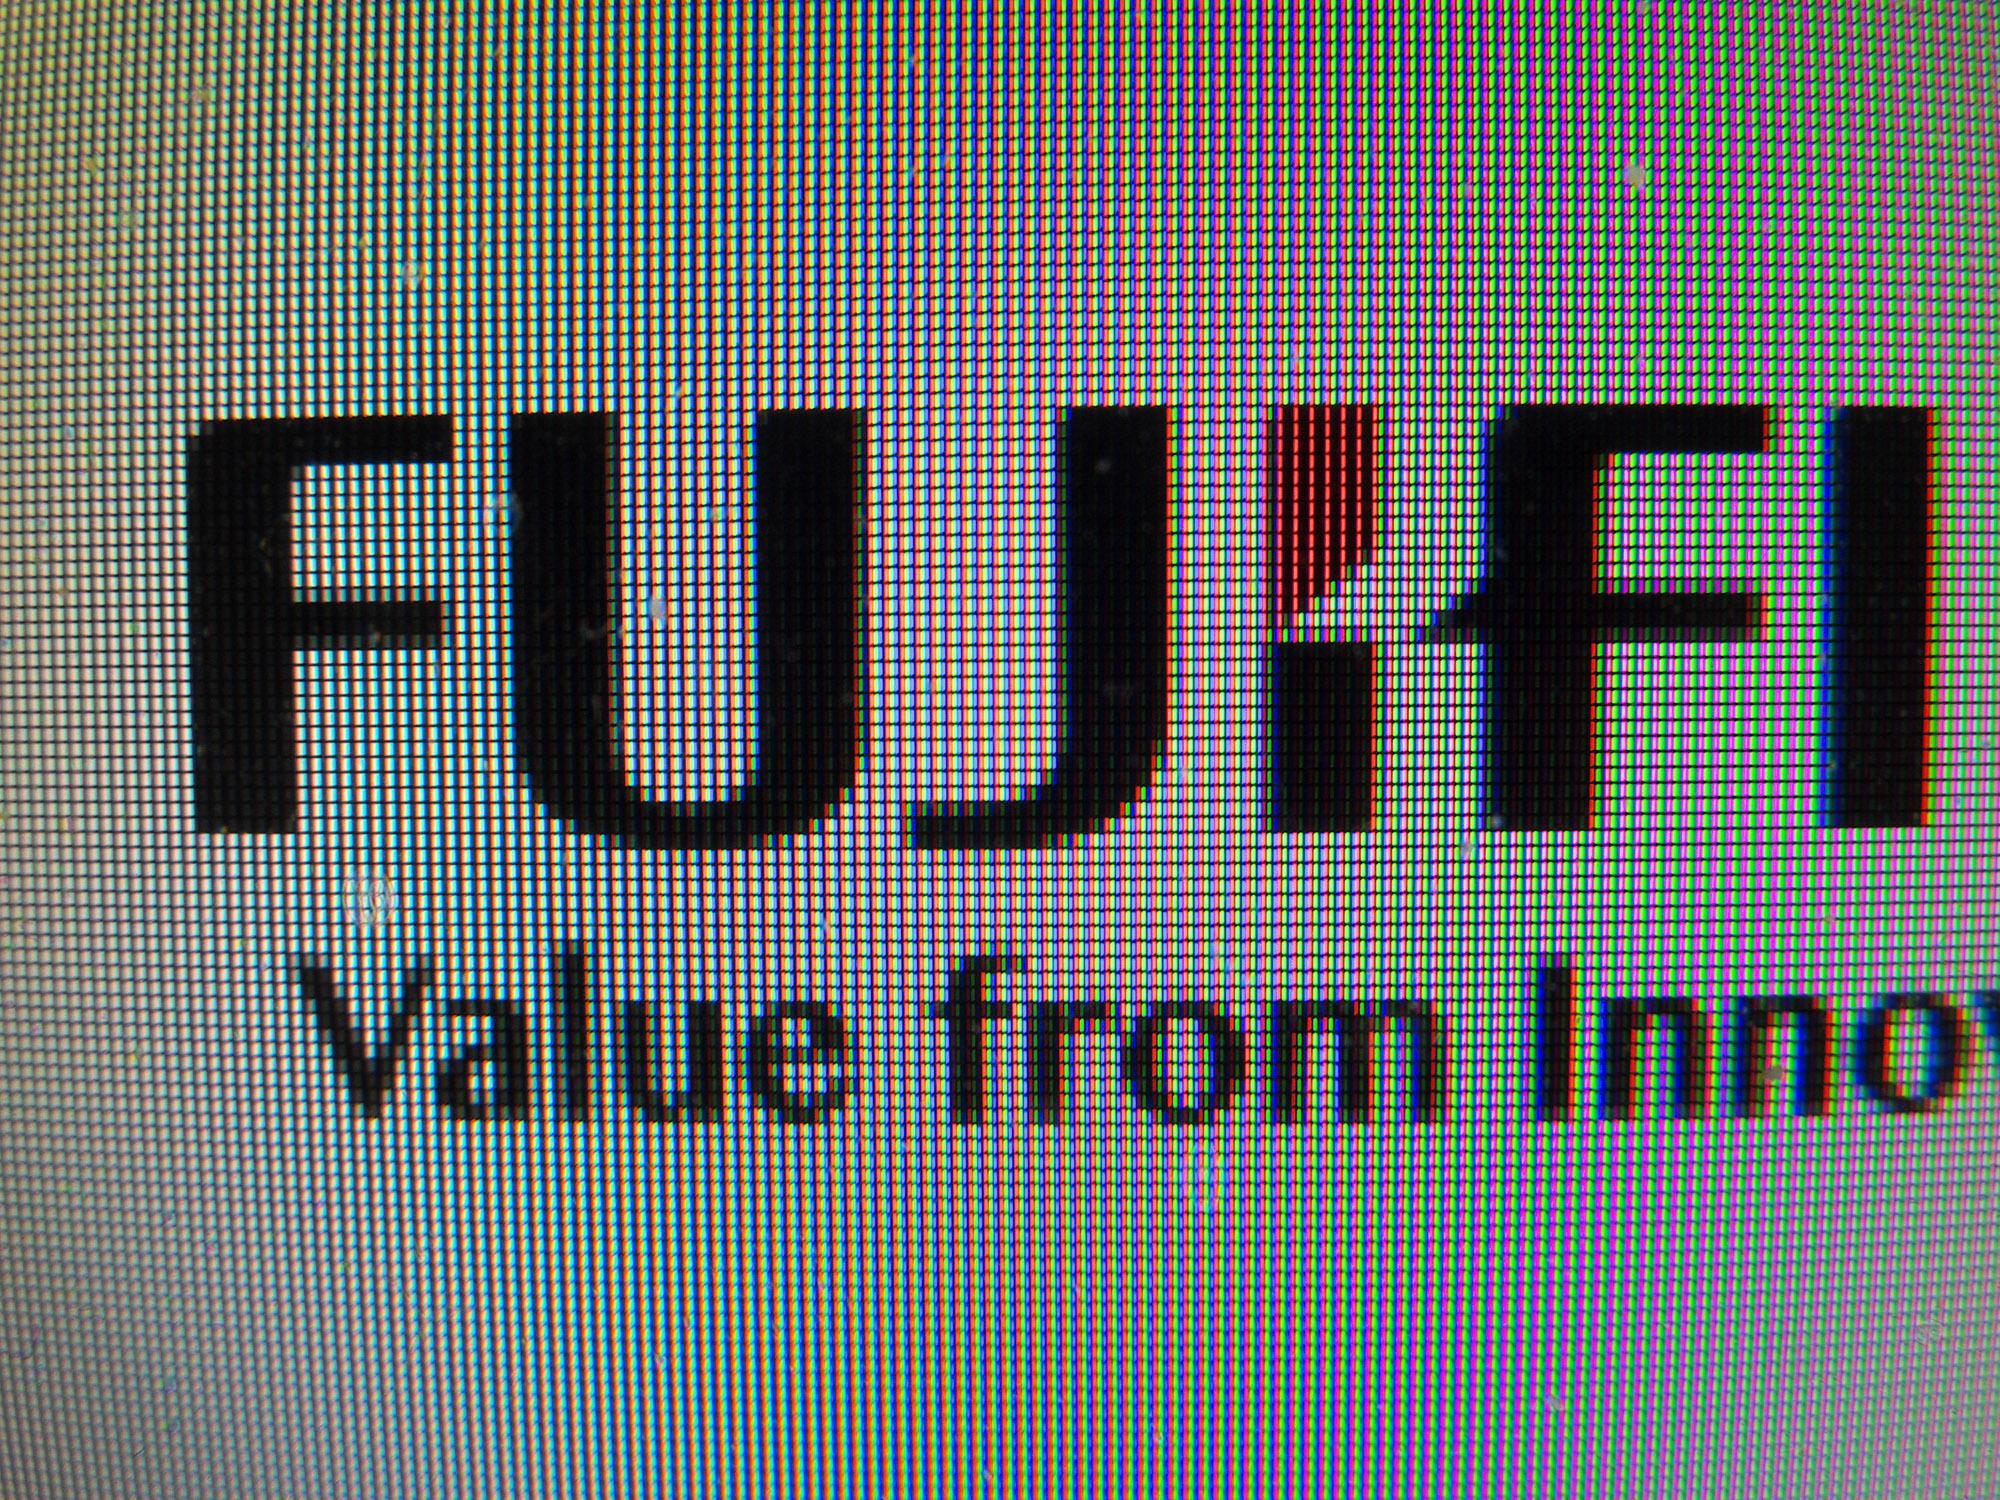 fujifilm-x30-review-13